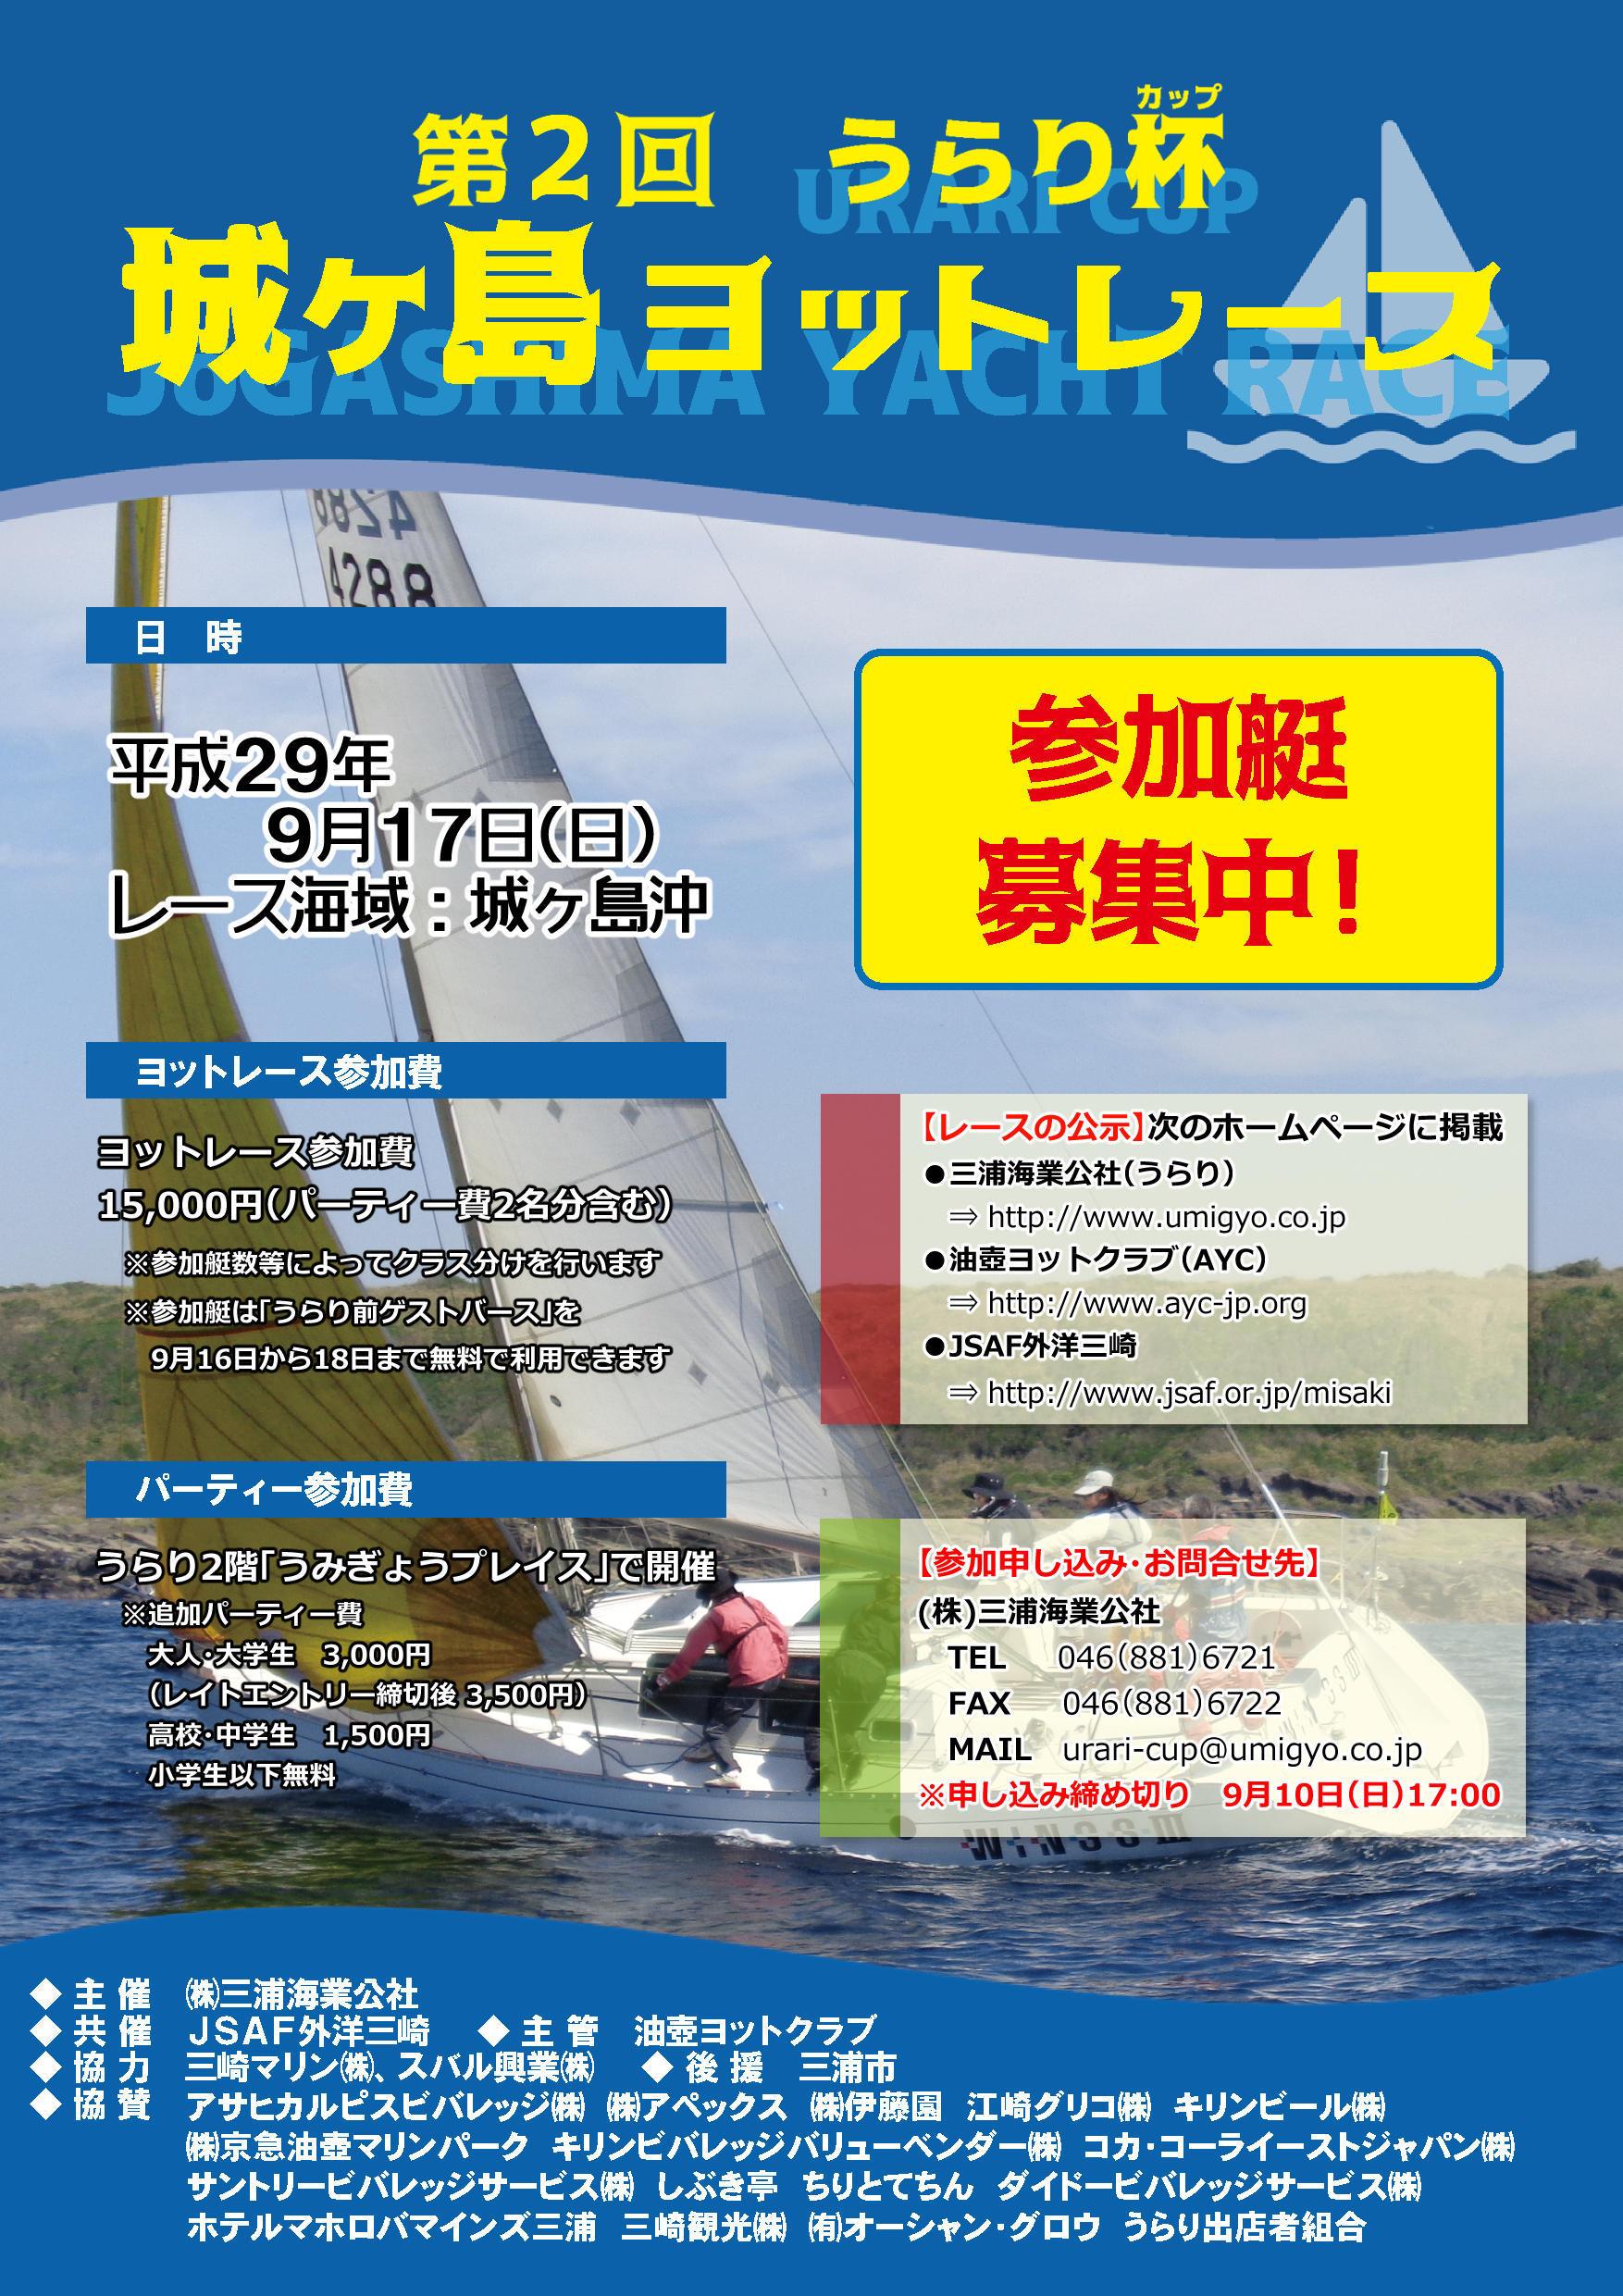 http://www.umigyo.co.jp/update/728190883a2444e137f0681c3943eb19728c5ebc.jpg